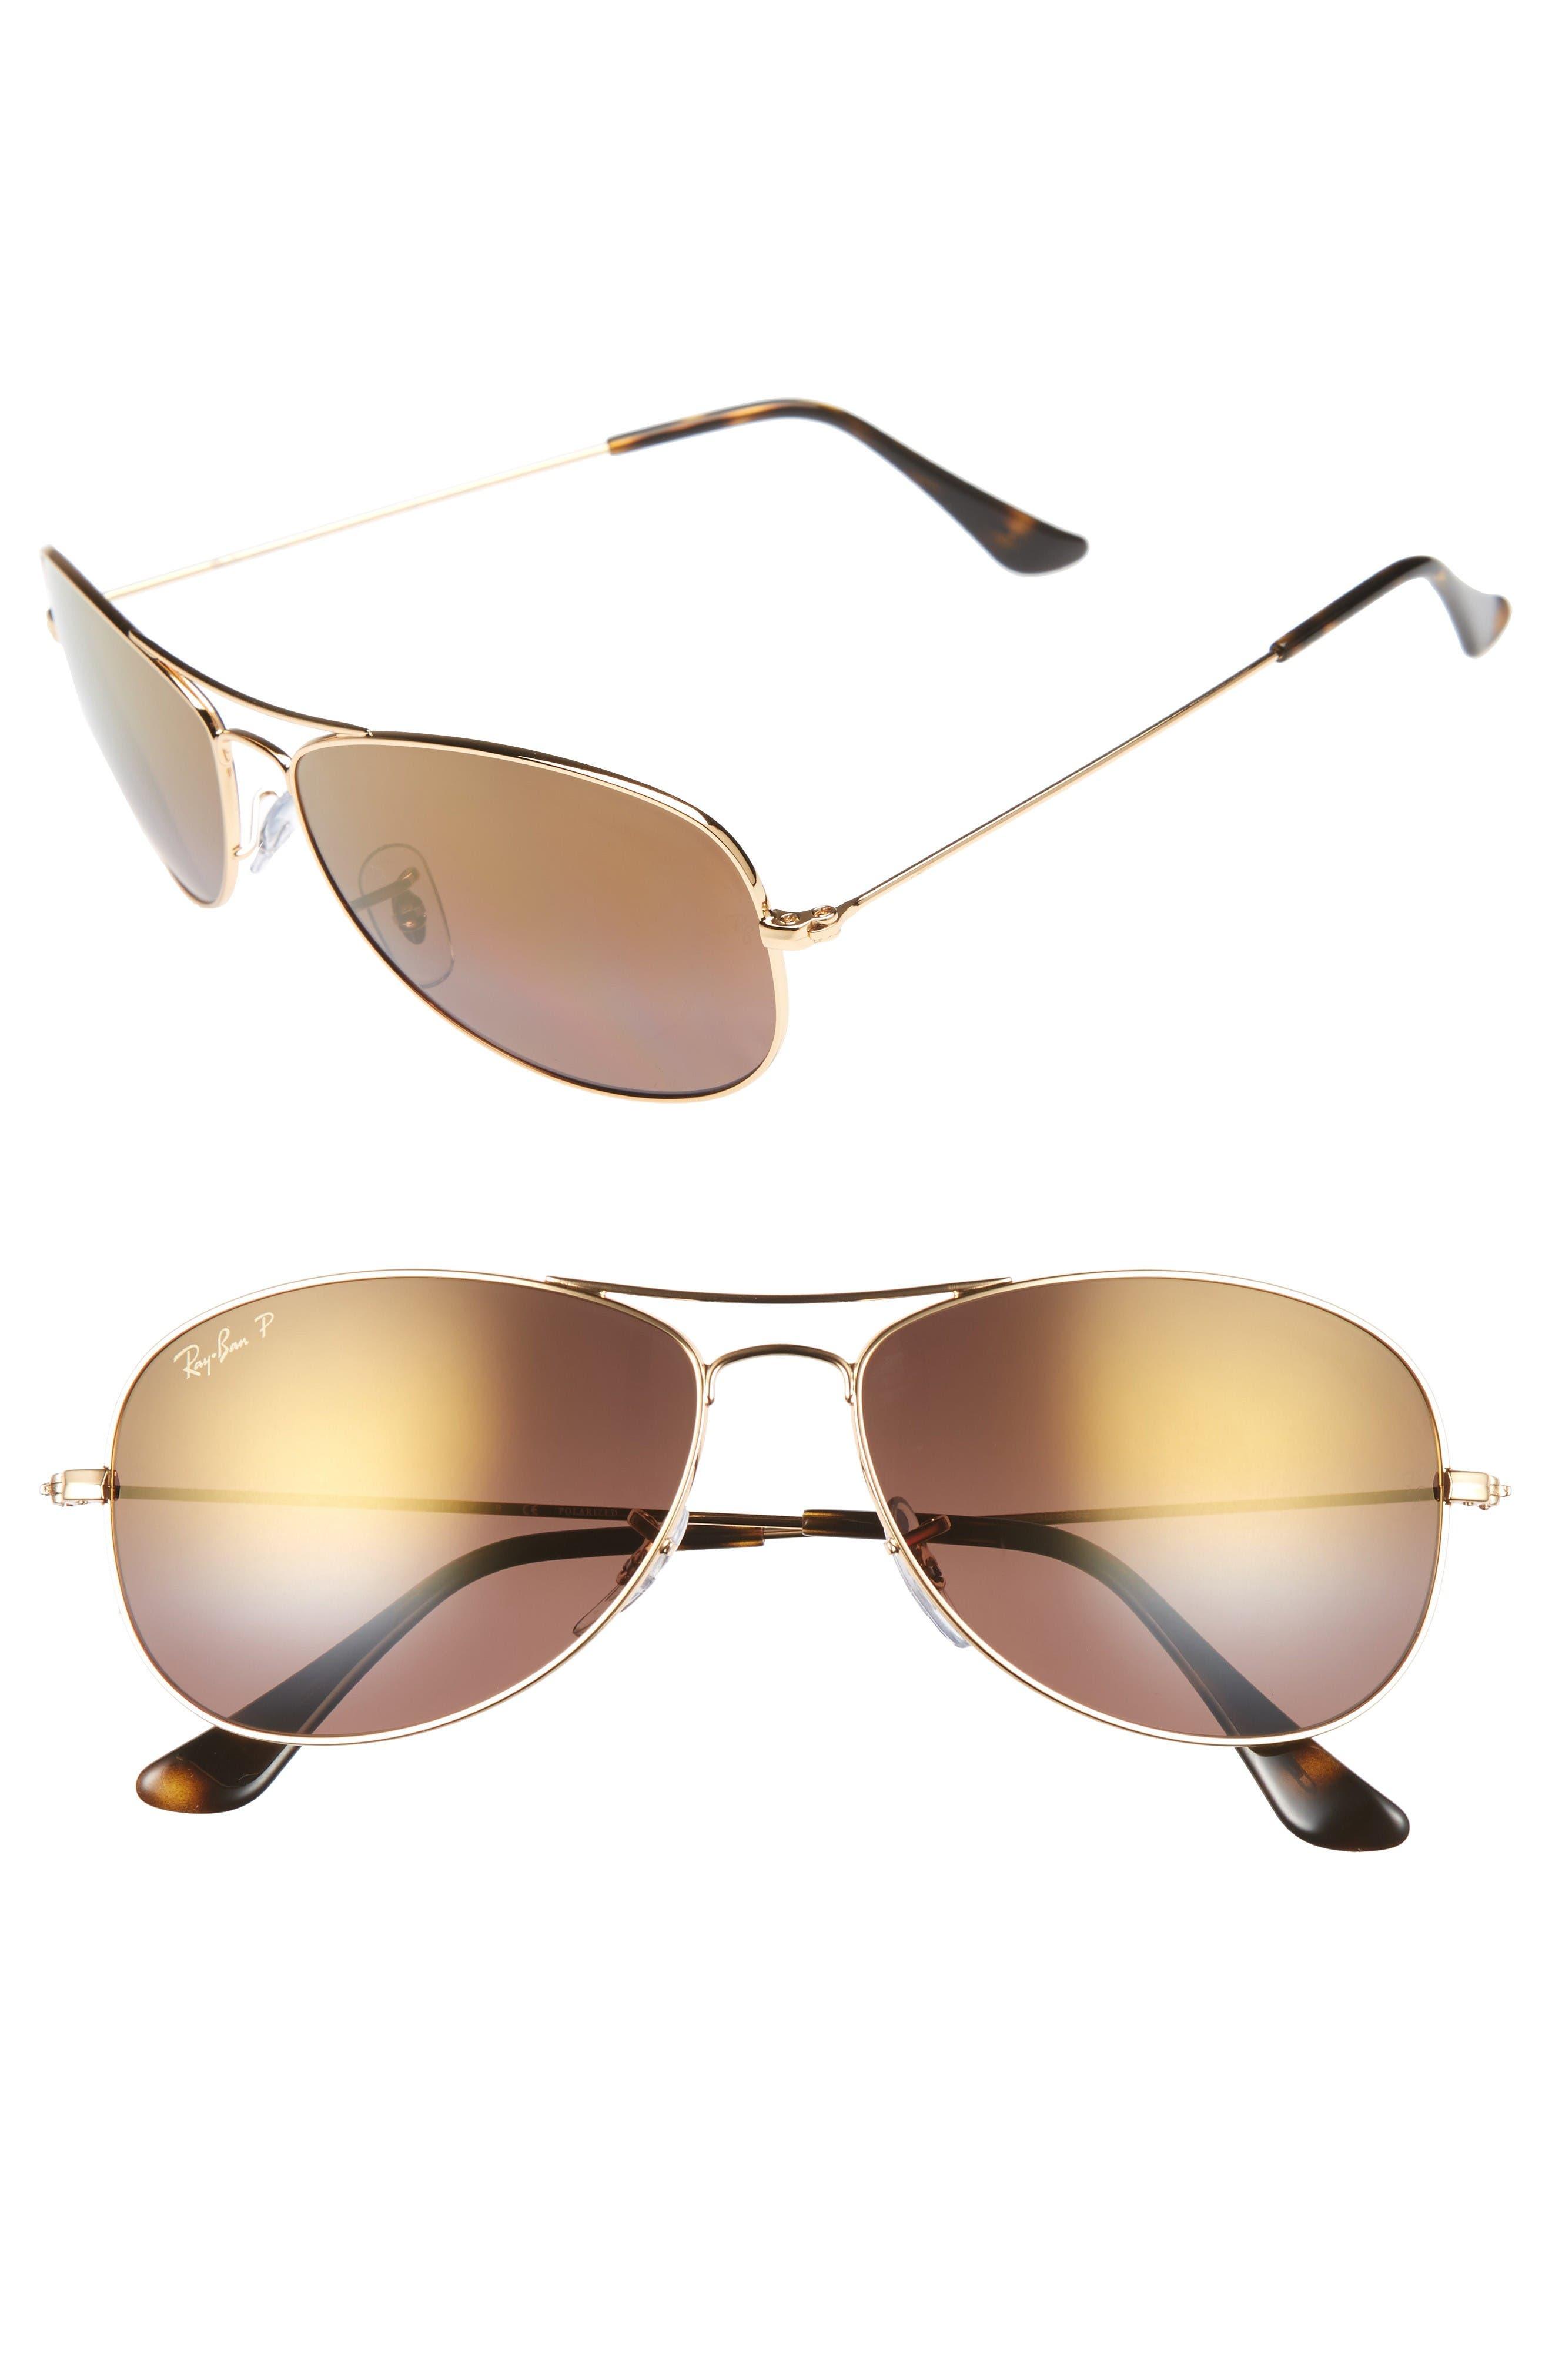 Main Image - Ray-Ban Tech 59mm Polarized Sunglasses